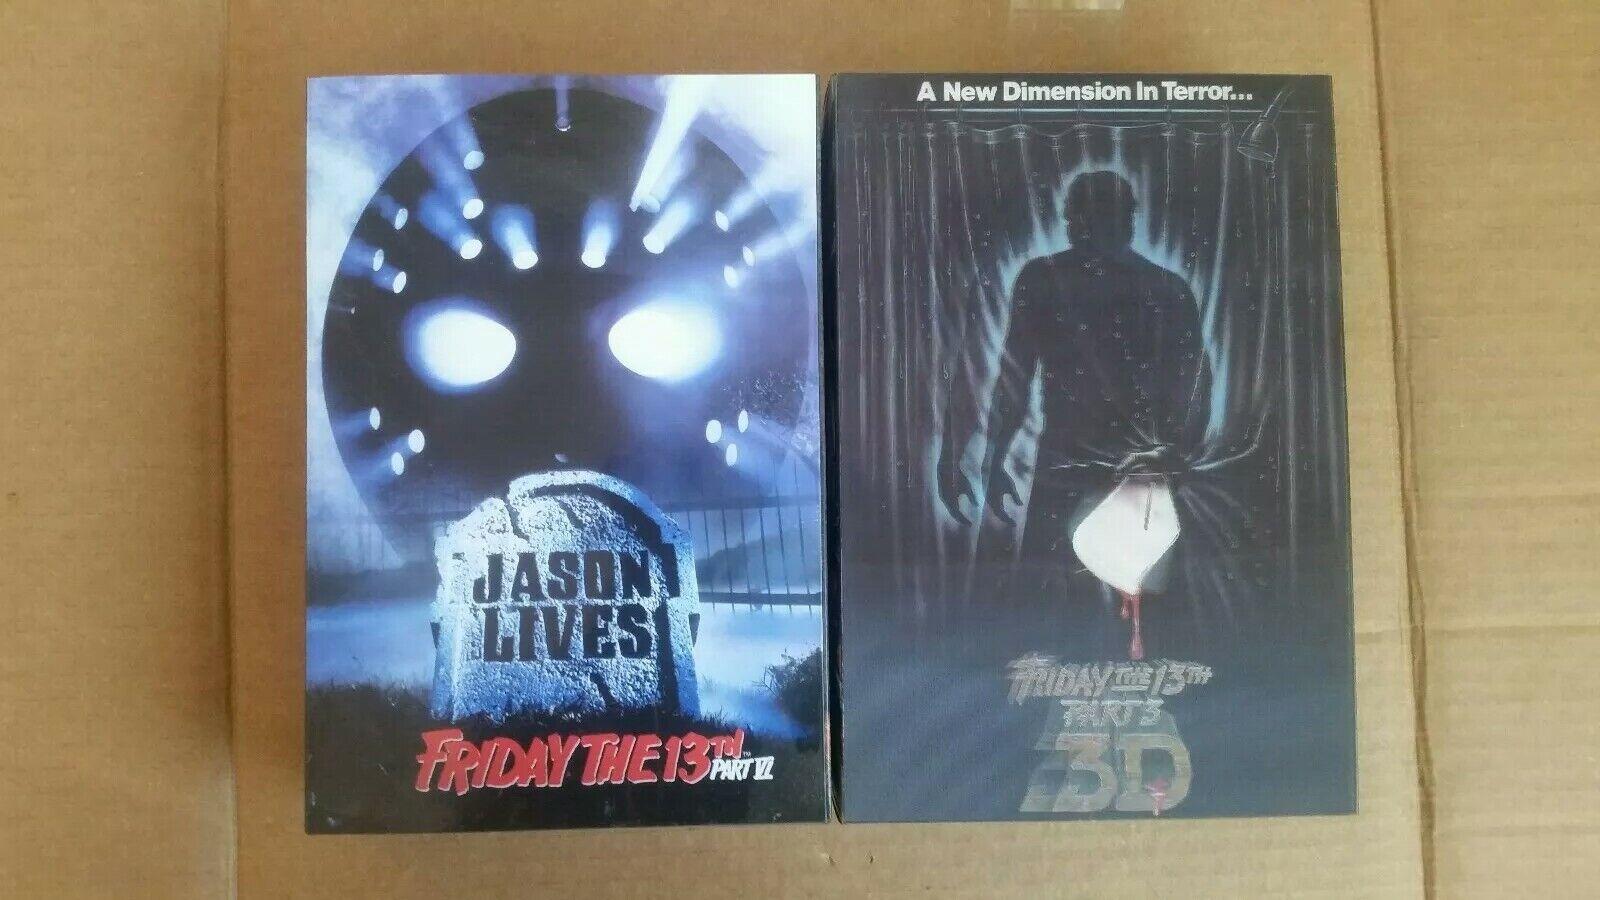 Jason Jason Jason Voorhees Friday the 13th figure part 3 + 6  Genuine neca cad